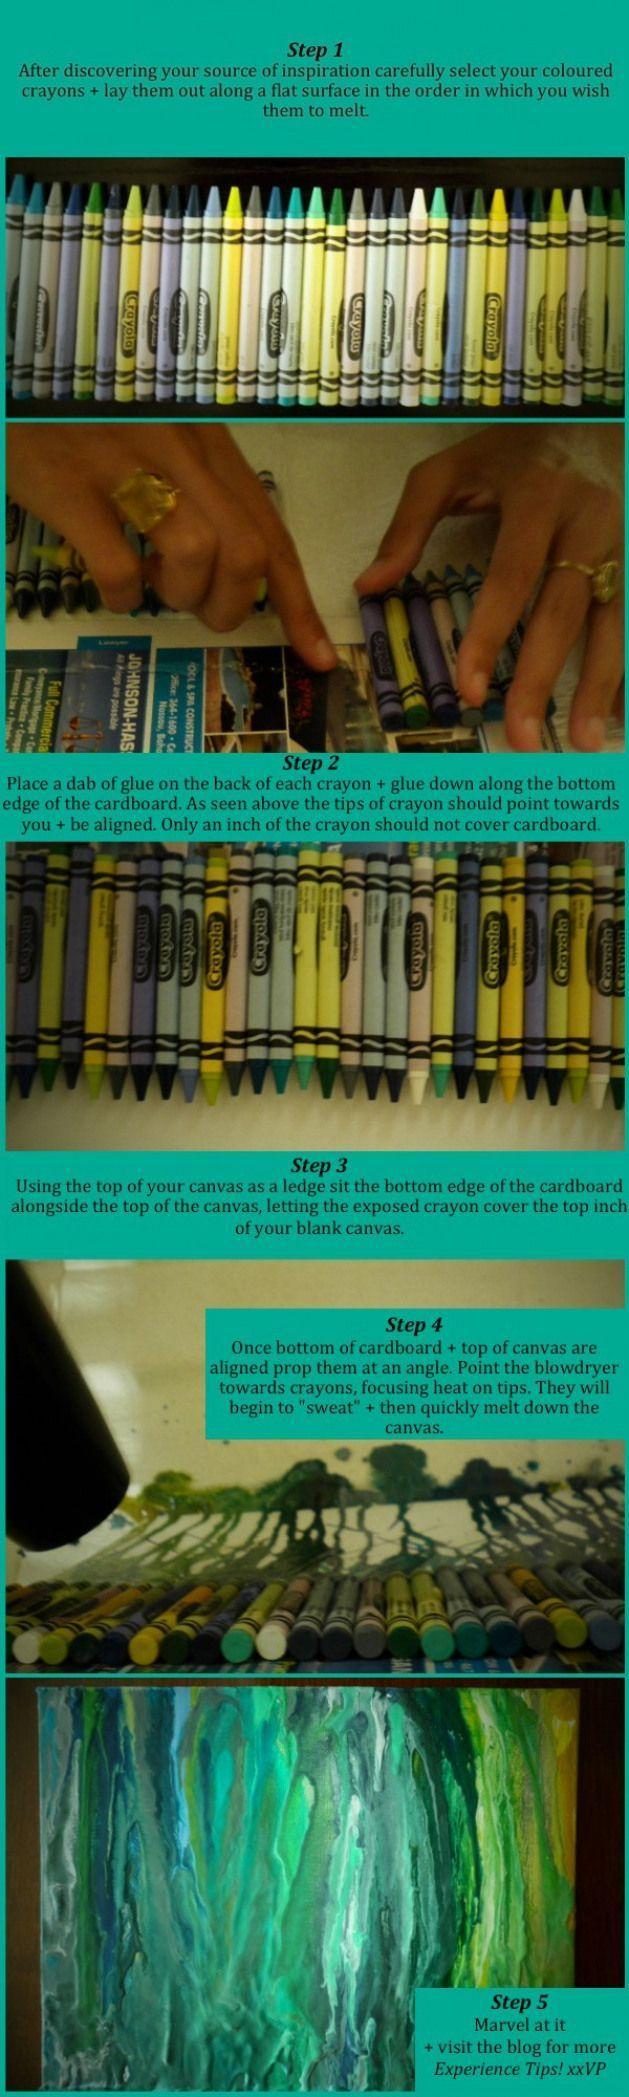 Photo of Melting Crayon Art Instructions # Freizeitraum # Freizeitraum #inspirati … –  …